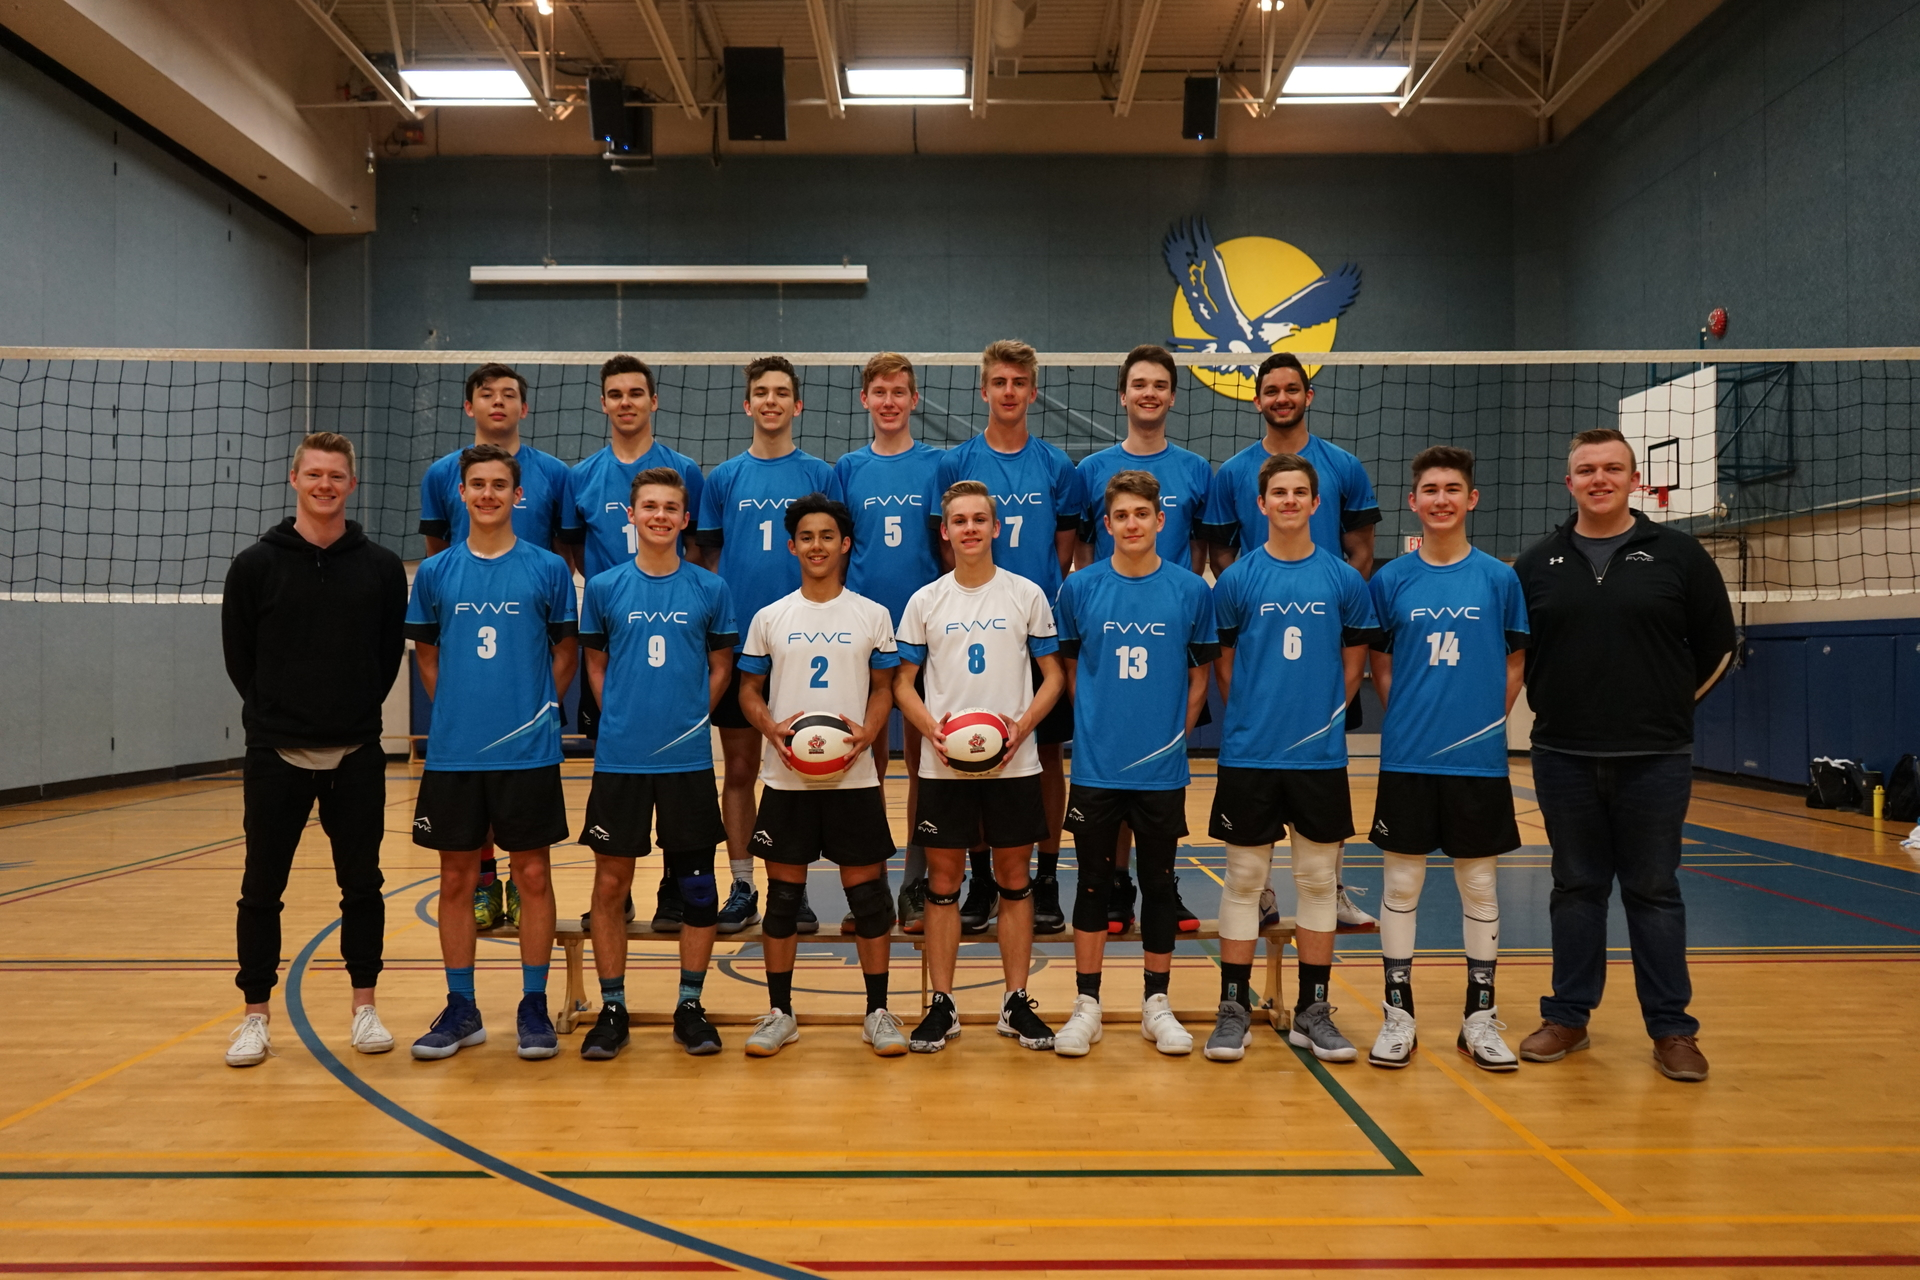 2018 Team Photo 17U FVVC.jpg